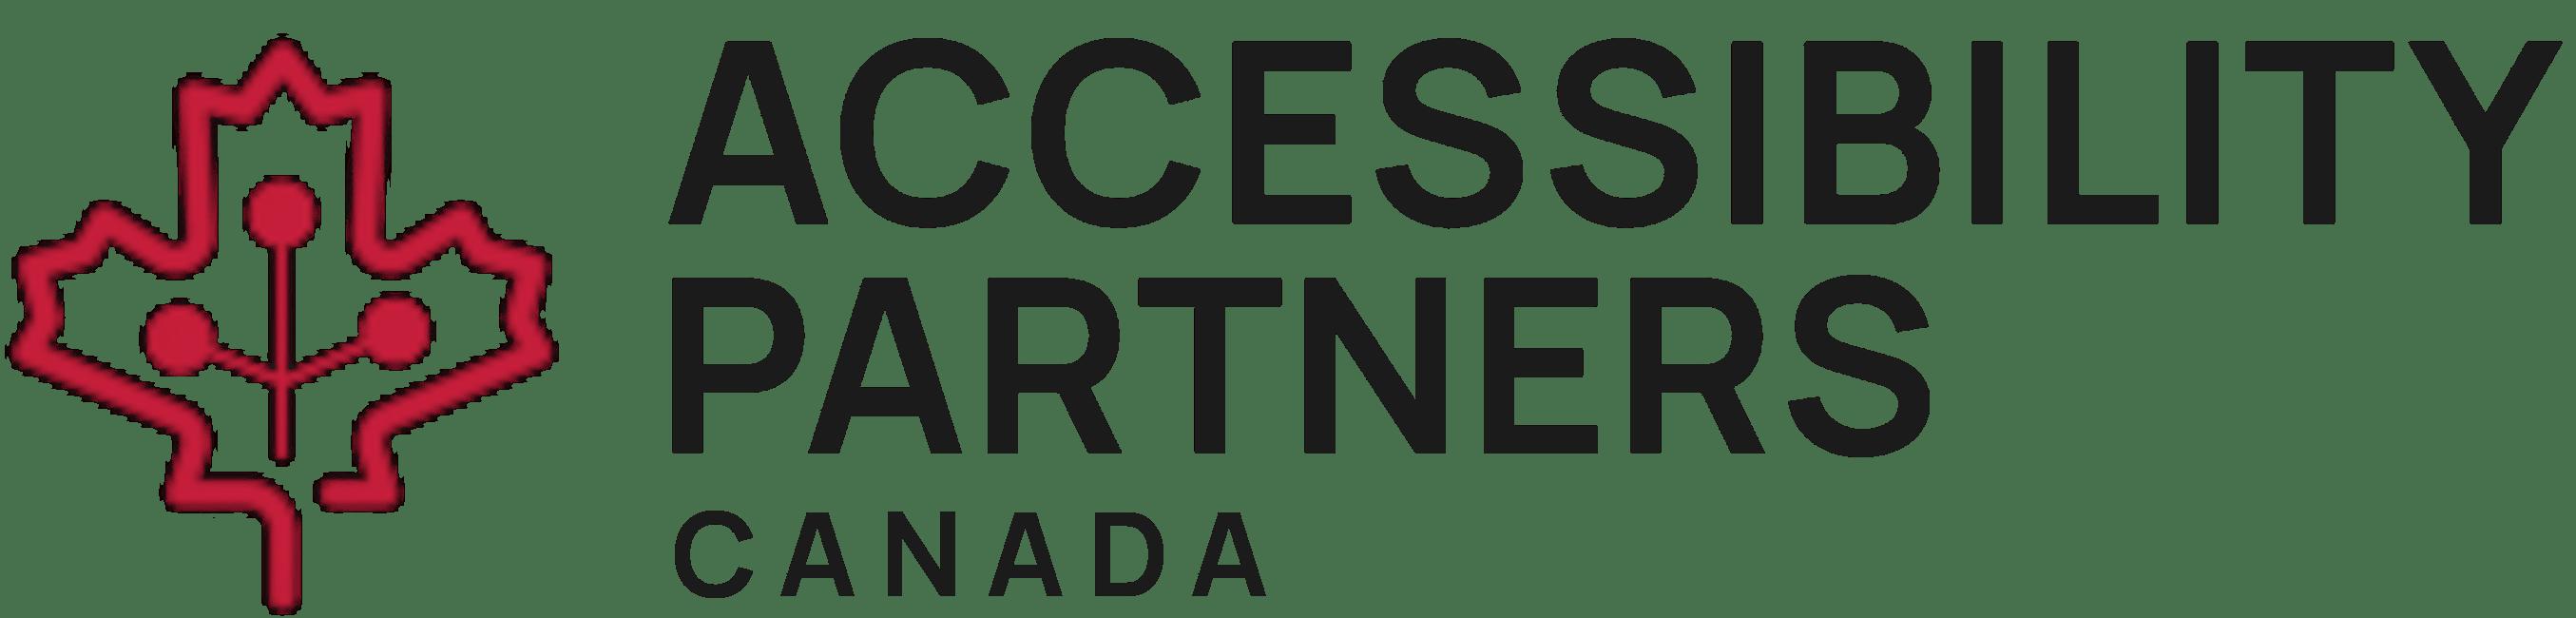 Accessibility Partners Canada Logo